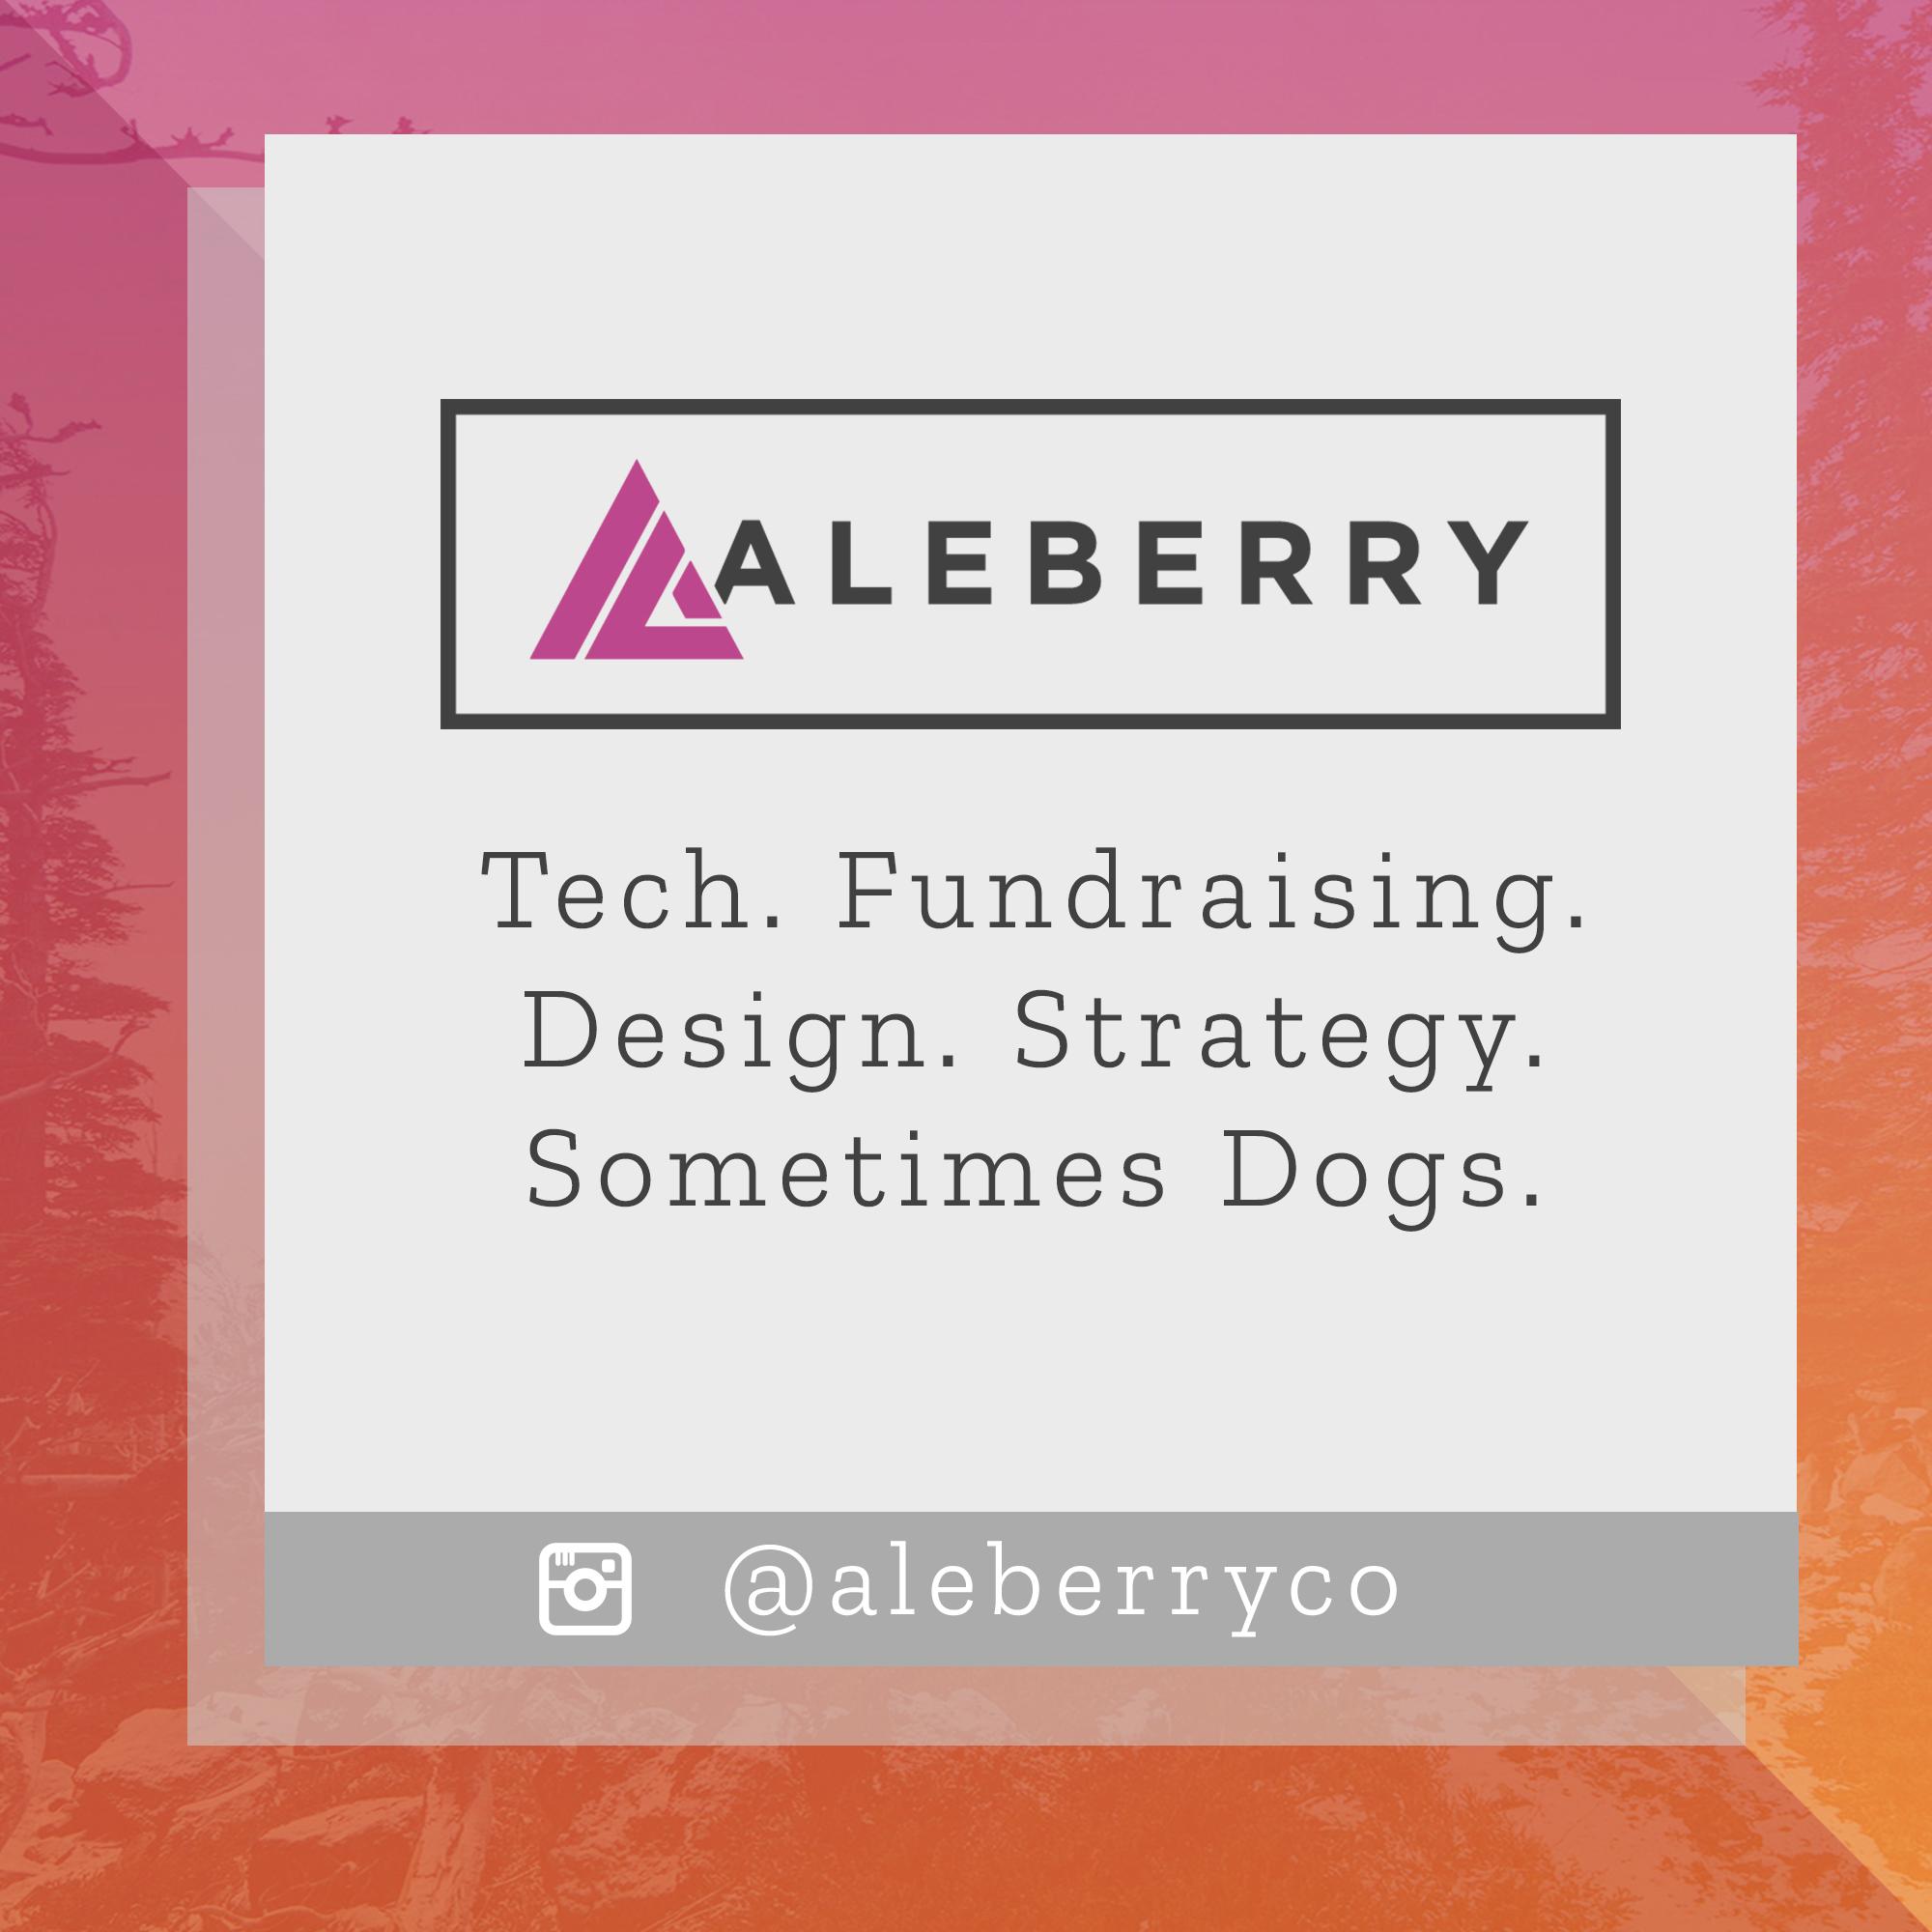 Aleberry Instagram